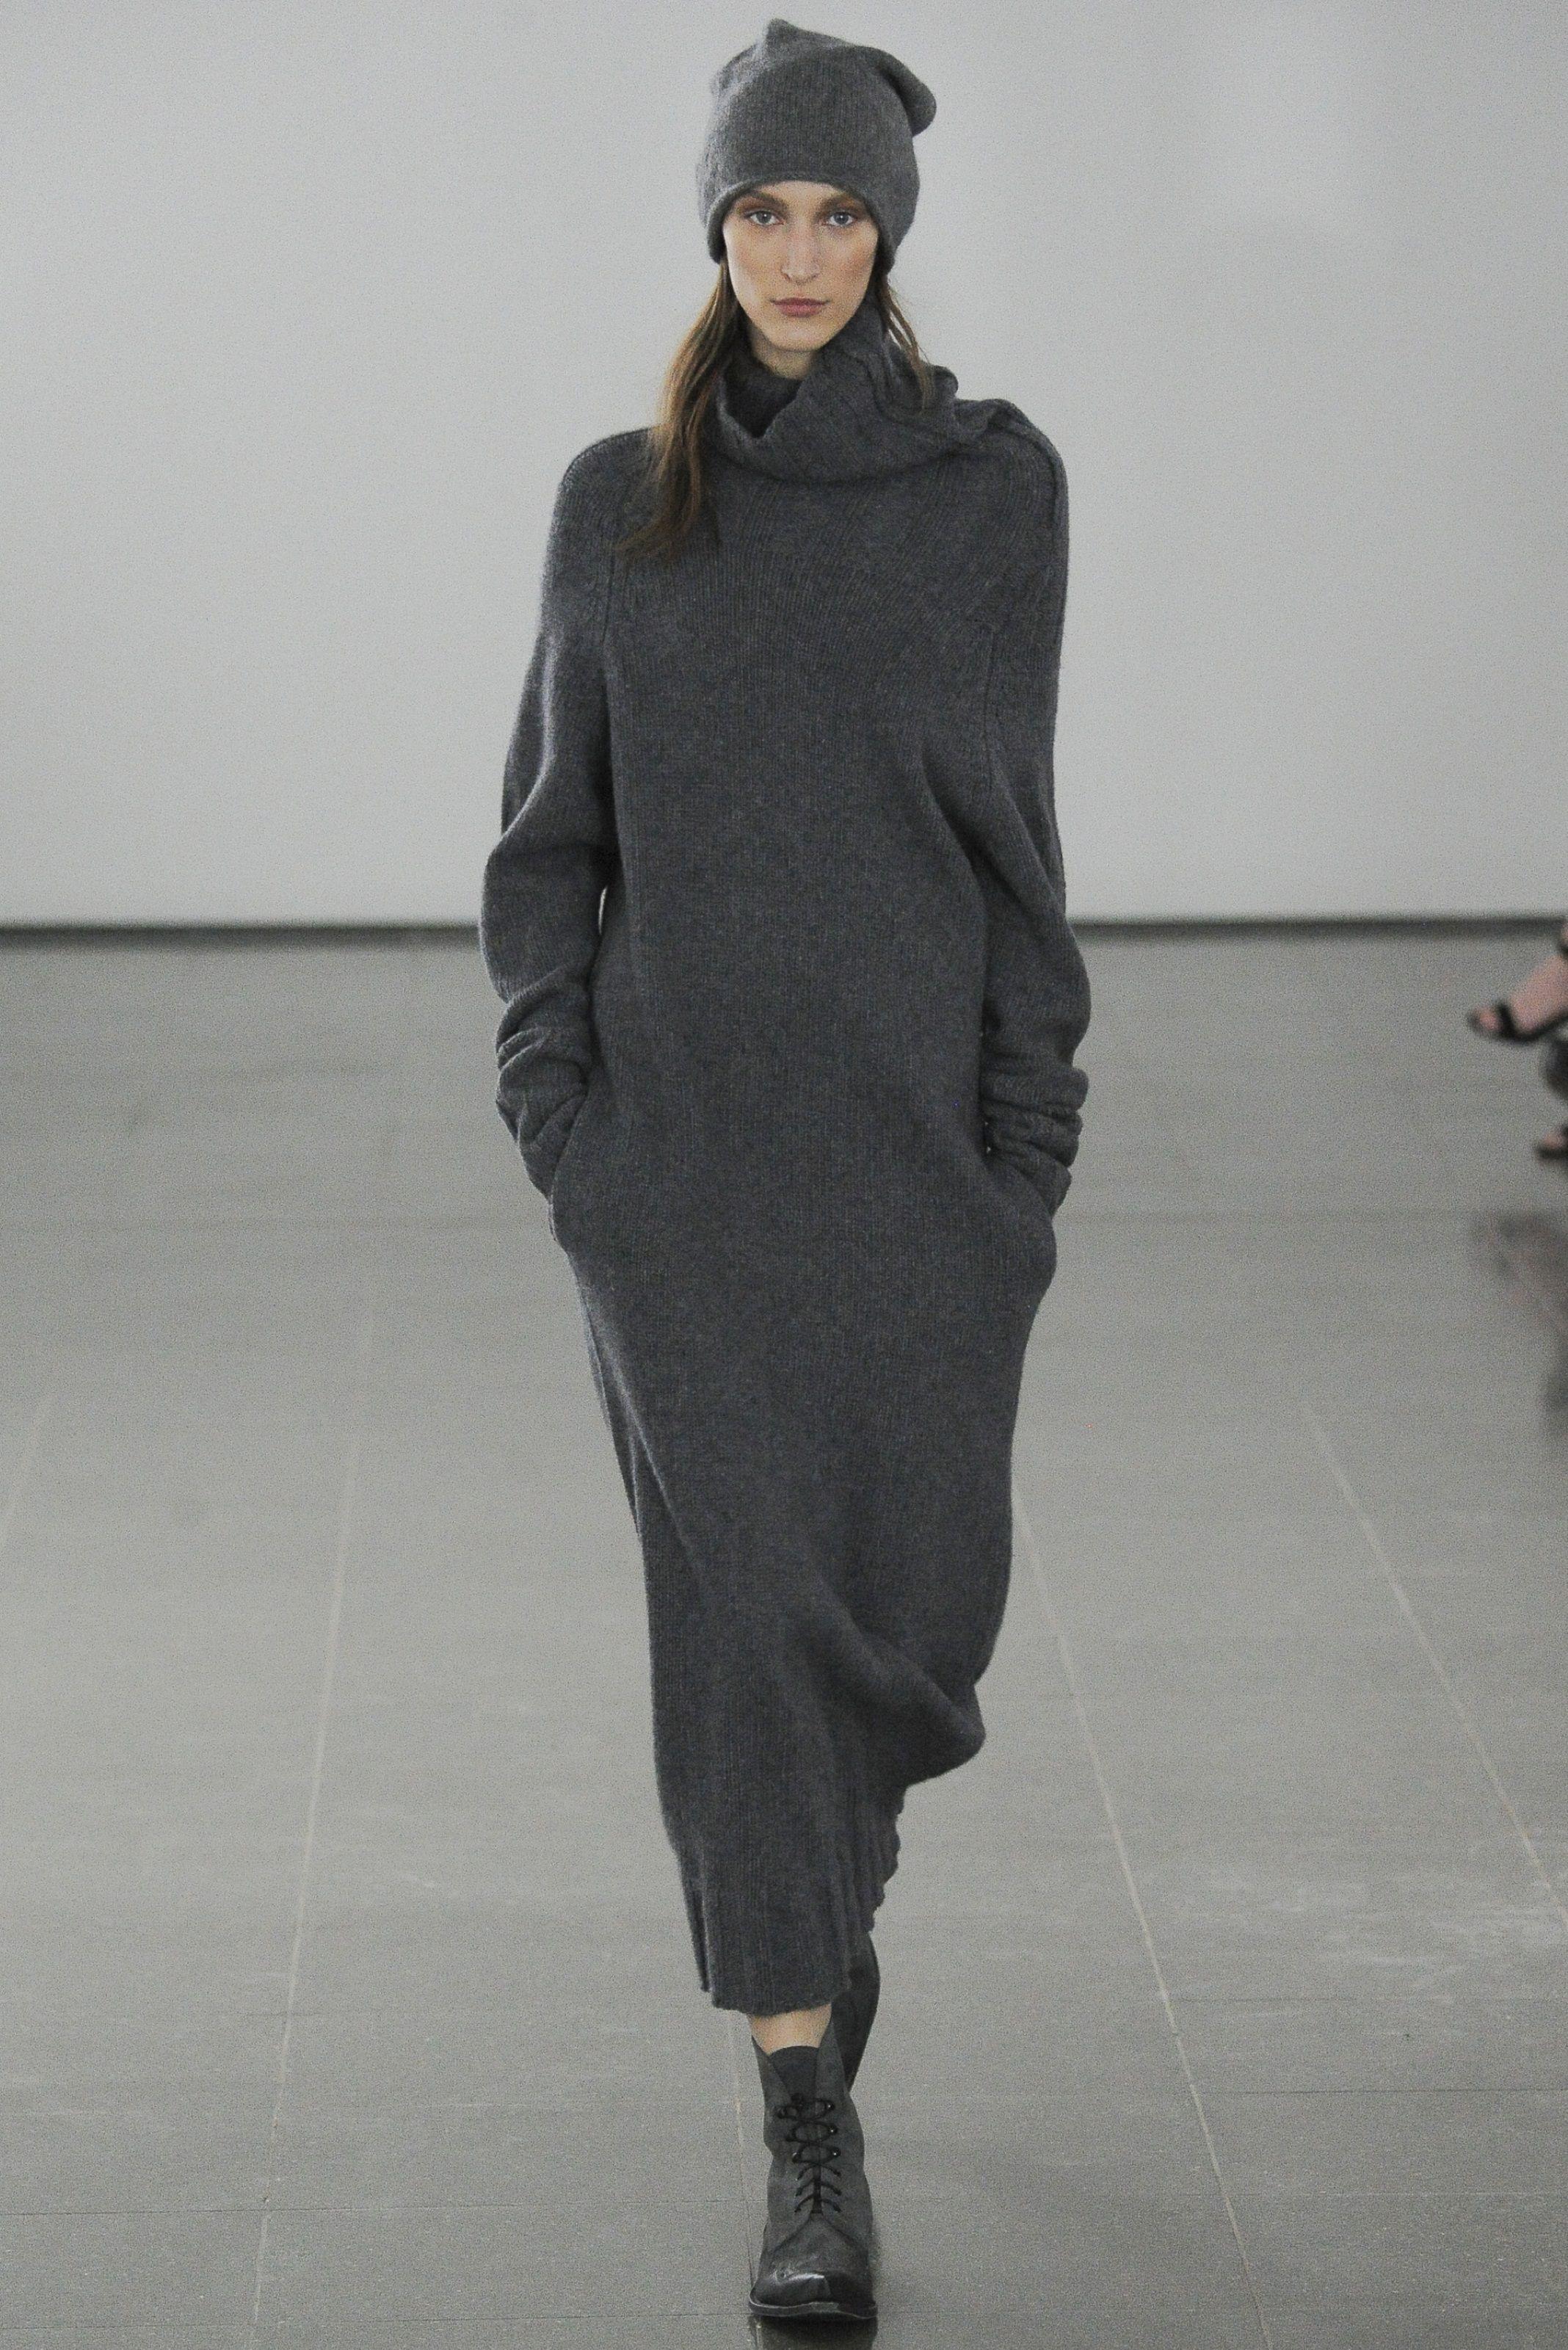 df555b30590a0c Dark grey long knitted dress by Joseph. Fall 2014.